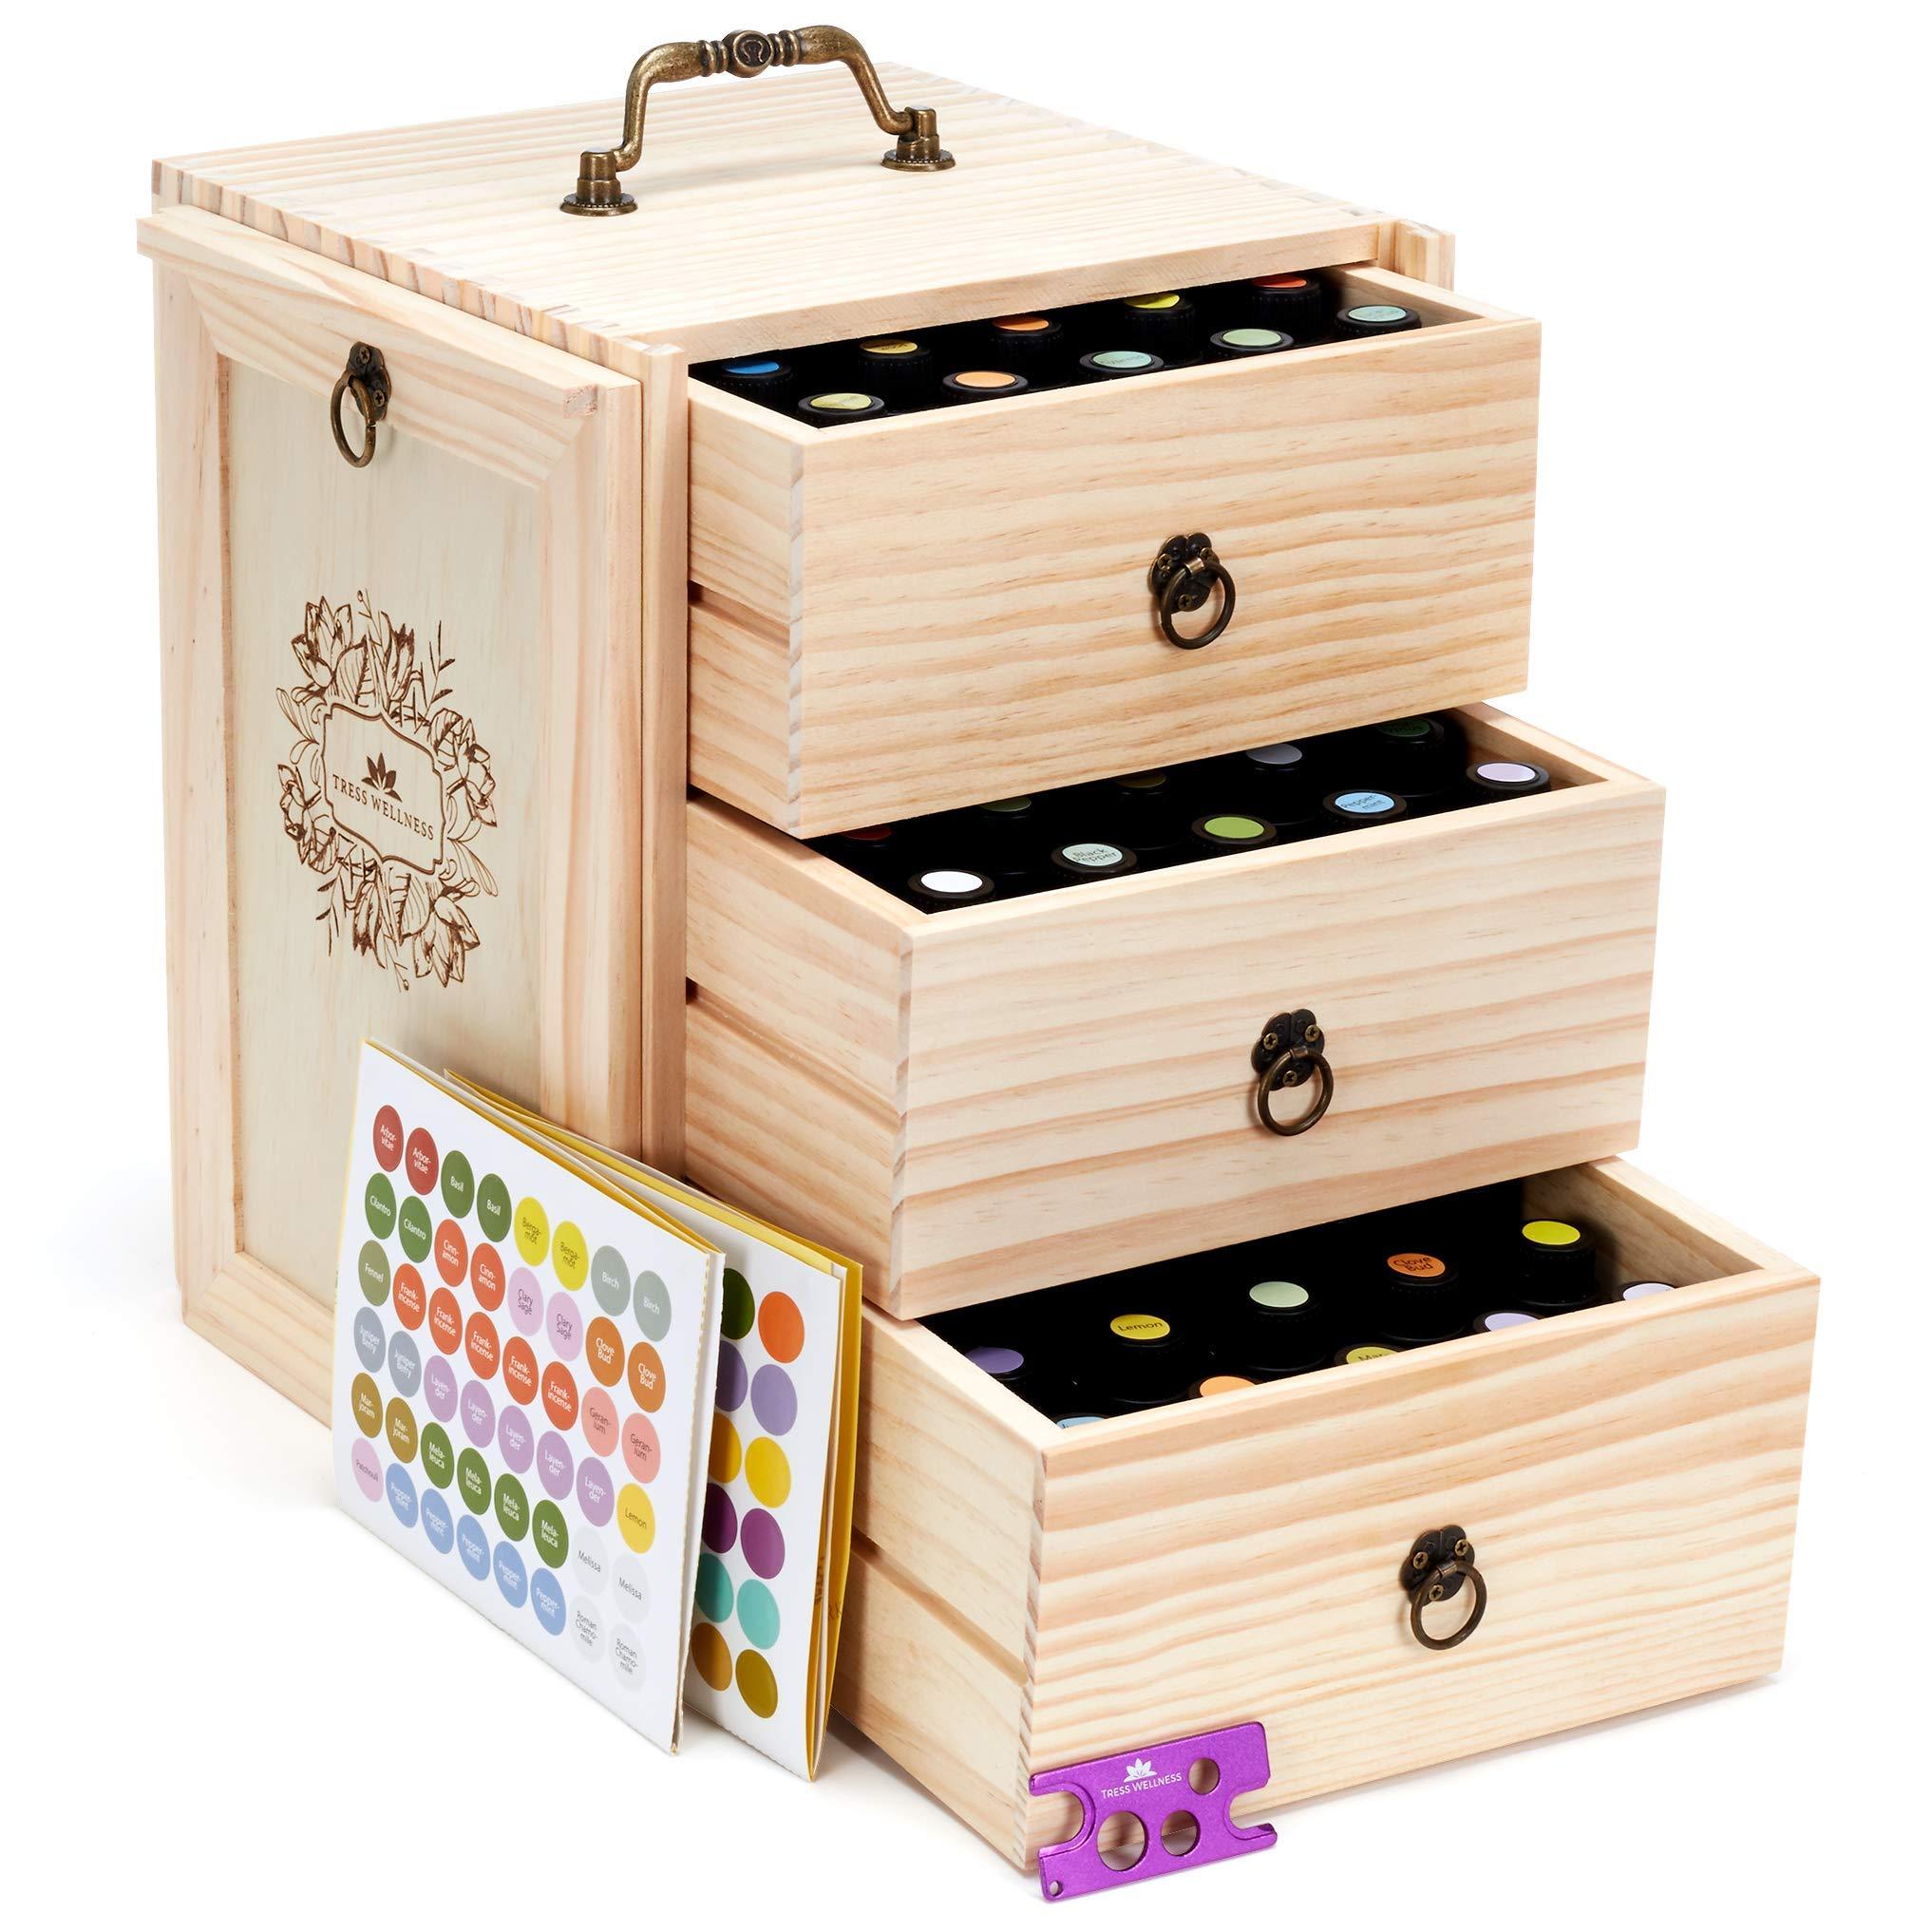 Essential Oils Storage for 75 Bottles - Holds 5 10 15 20 30 ml Young Living & Doterra bottles - Essential Oil Box - Essential Oil Case - Essential Oil Storage box - Essential oil Holder Organizer